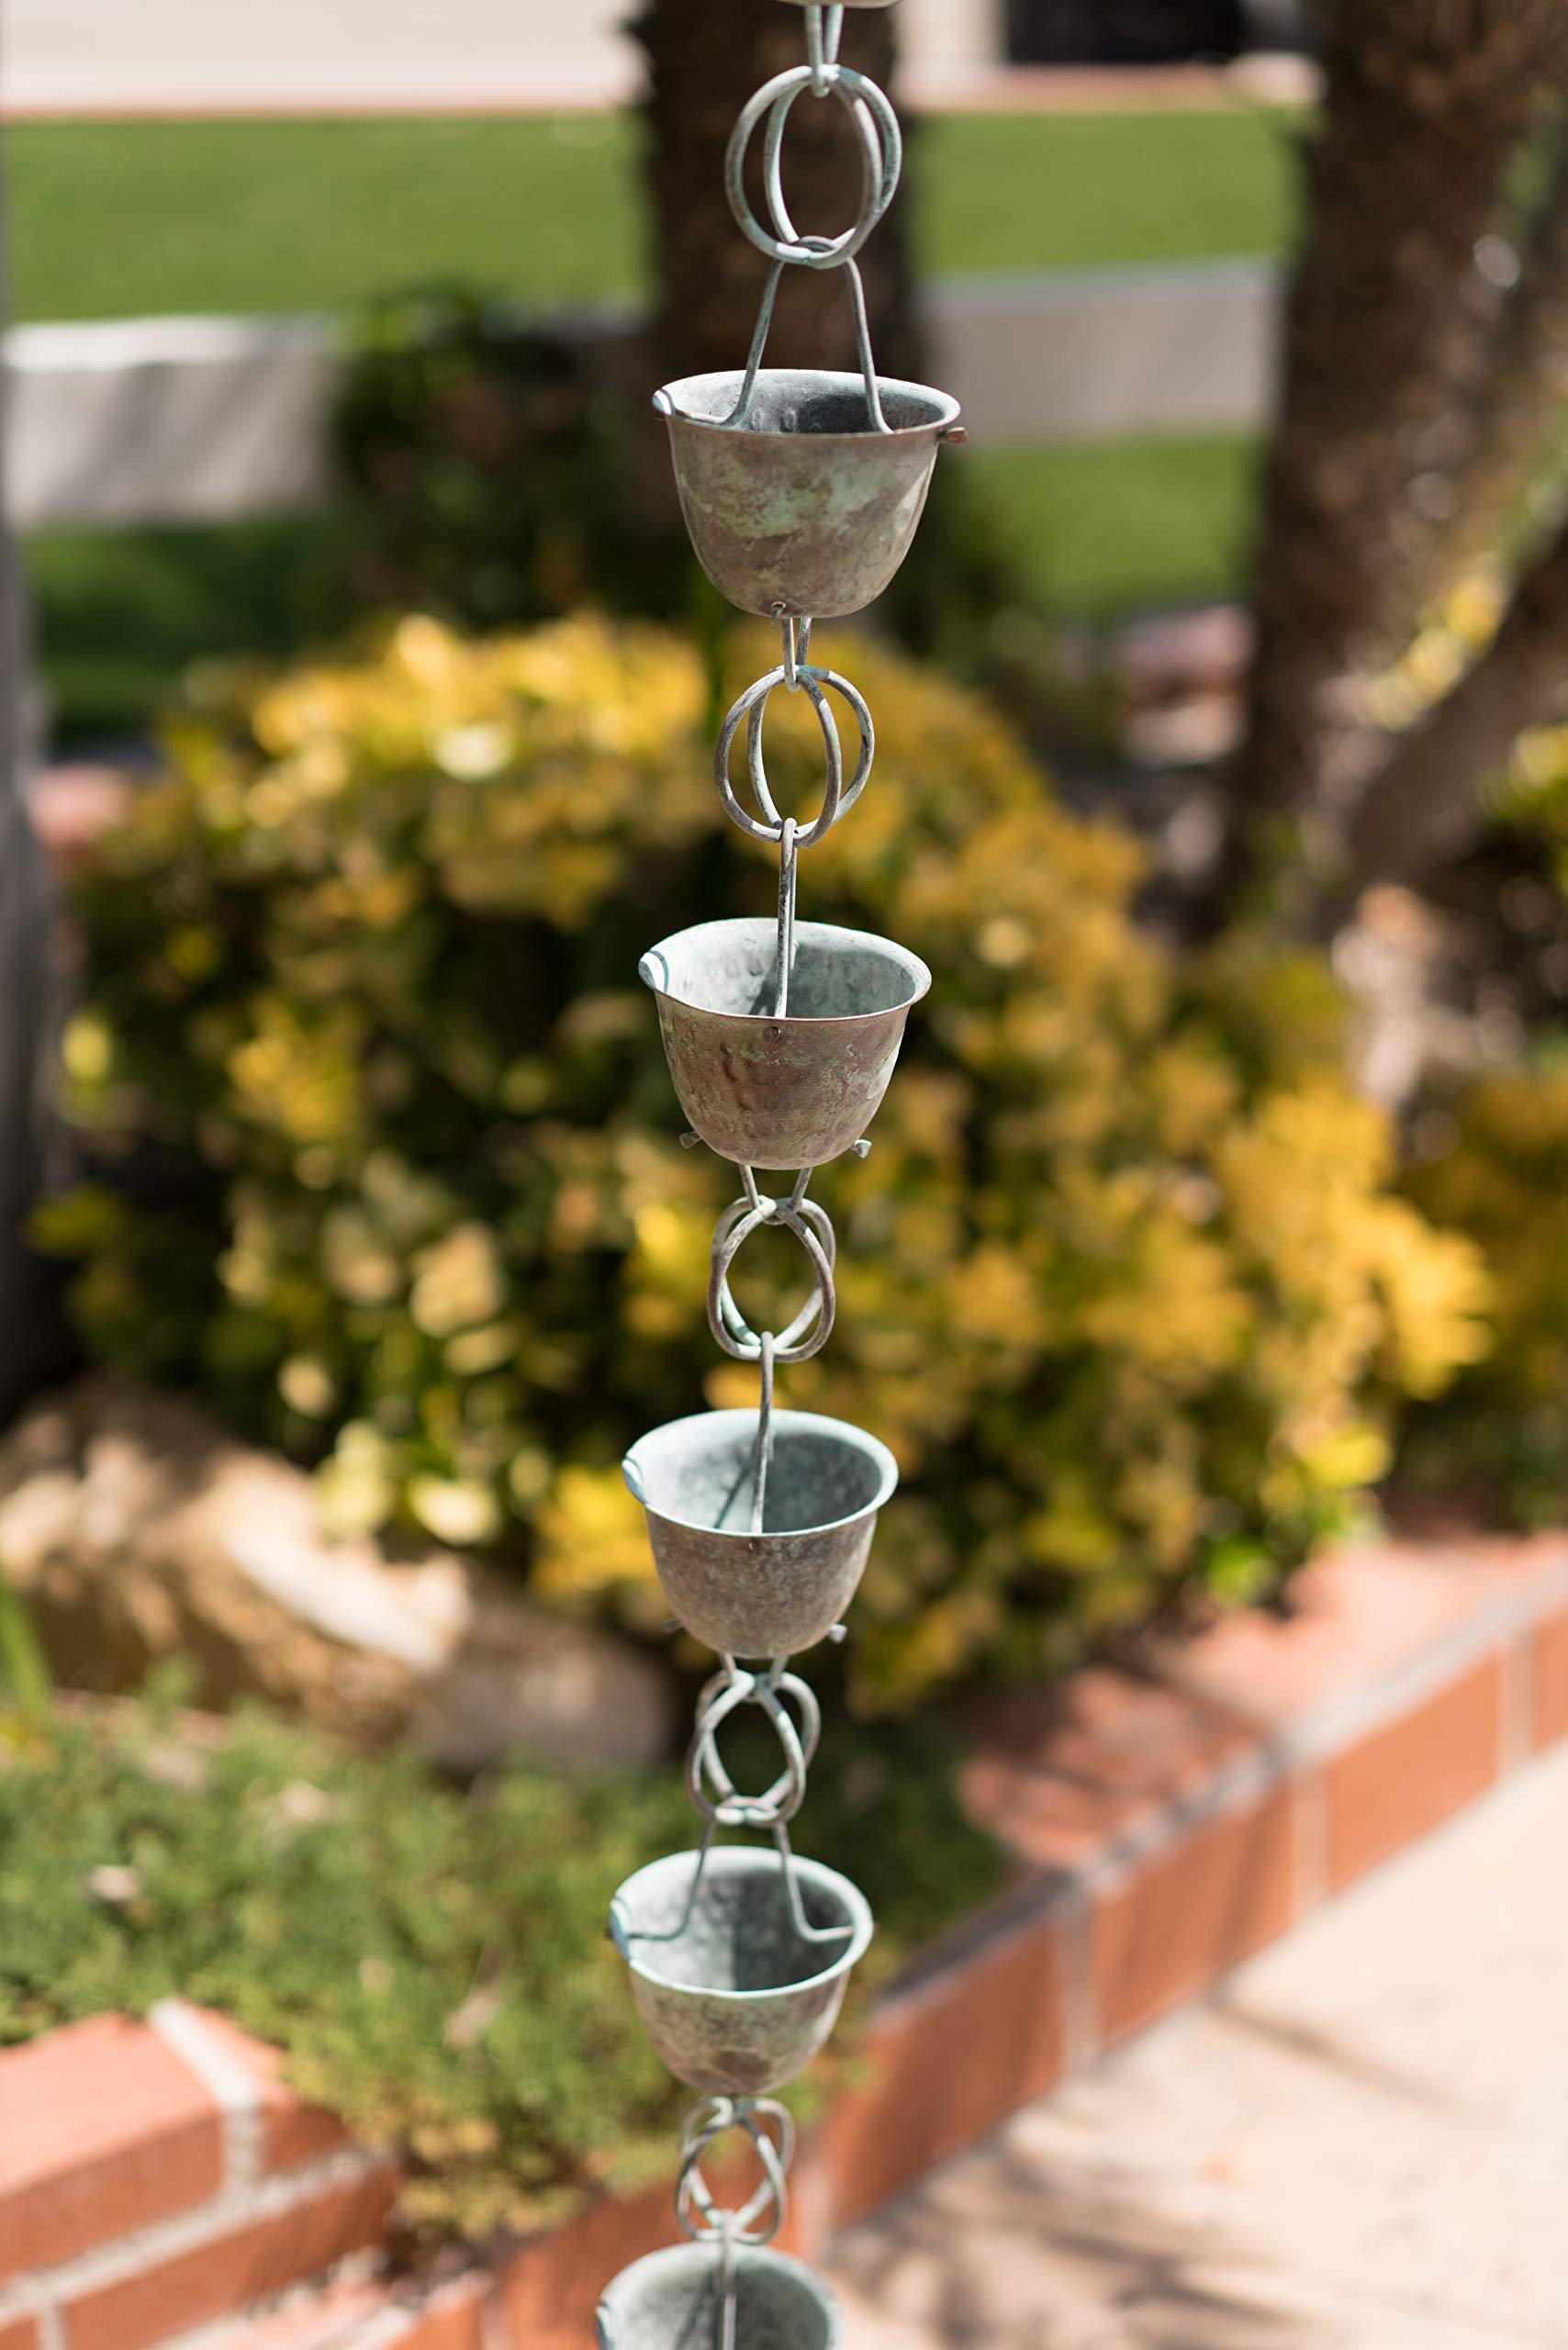 Monarch Pure Copper Hammered Cup Rain Chain, 8-1/2-Feet Length (Green Patina) by Monarch Rain Chains